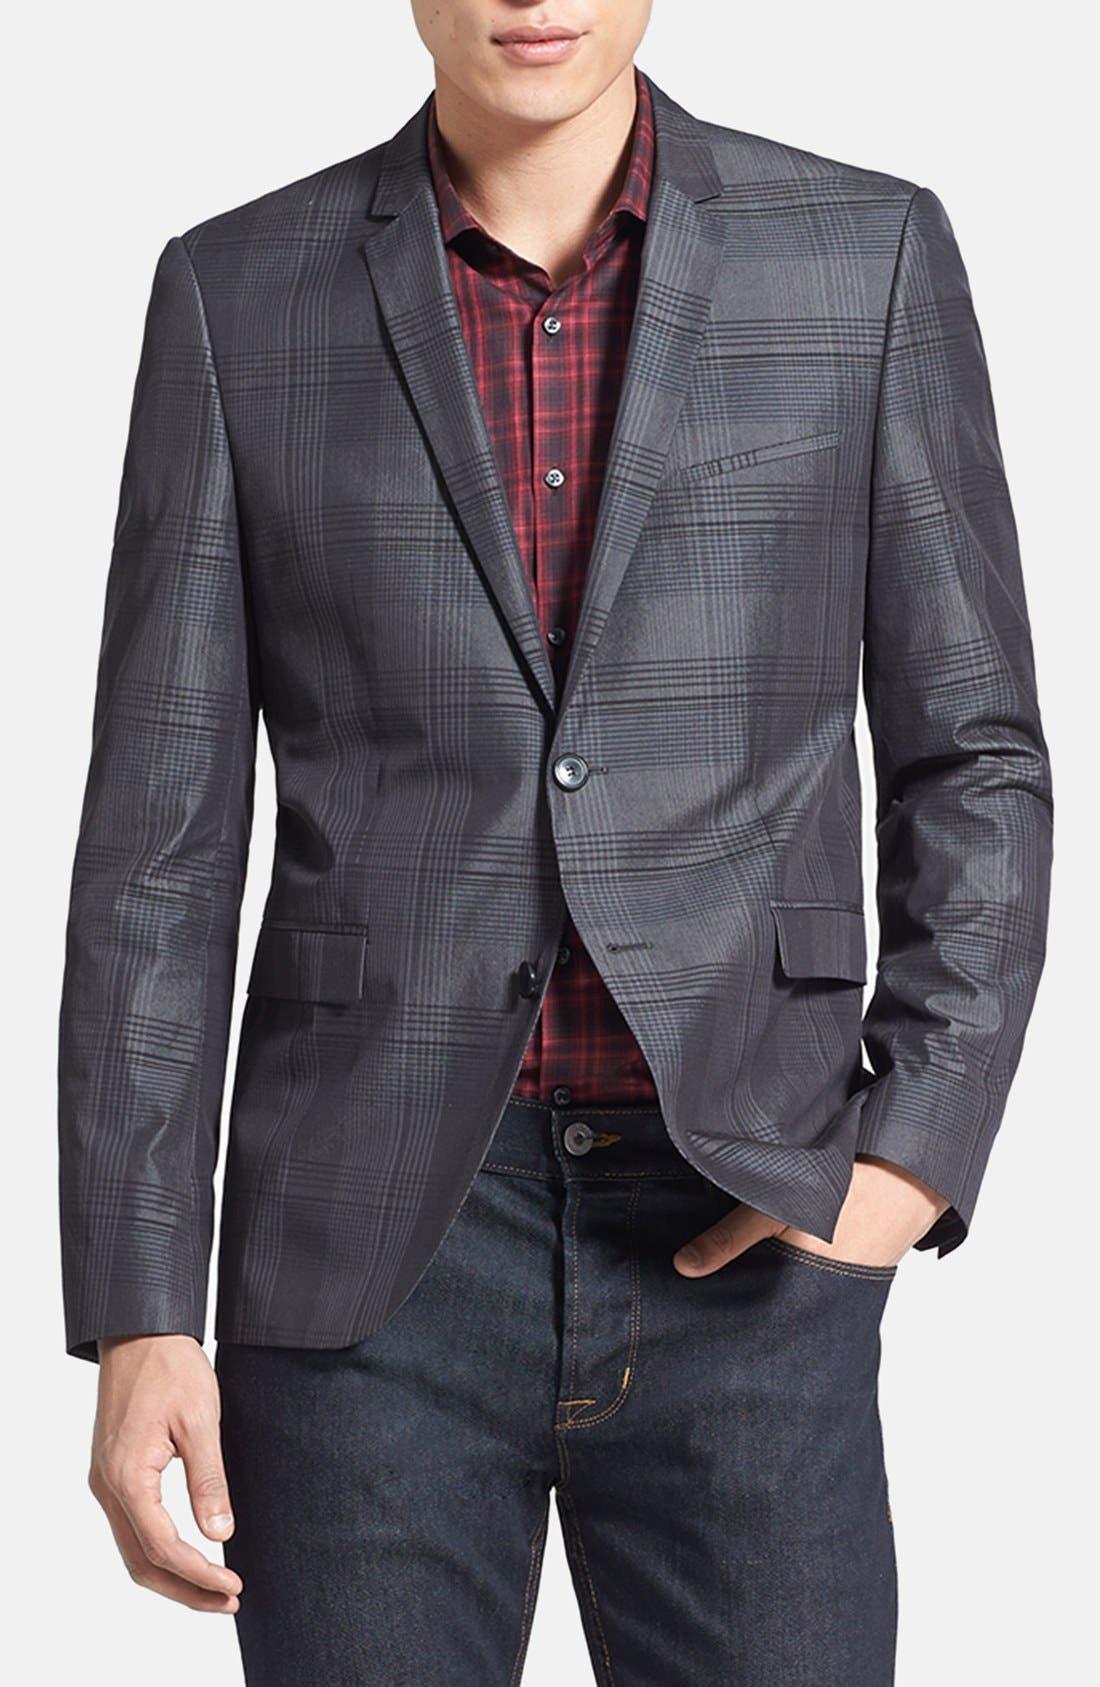 Alternate Image 1 Selected - HUGO 'Adris' Extra Trim Fit Plaid Sportcoat